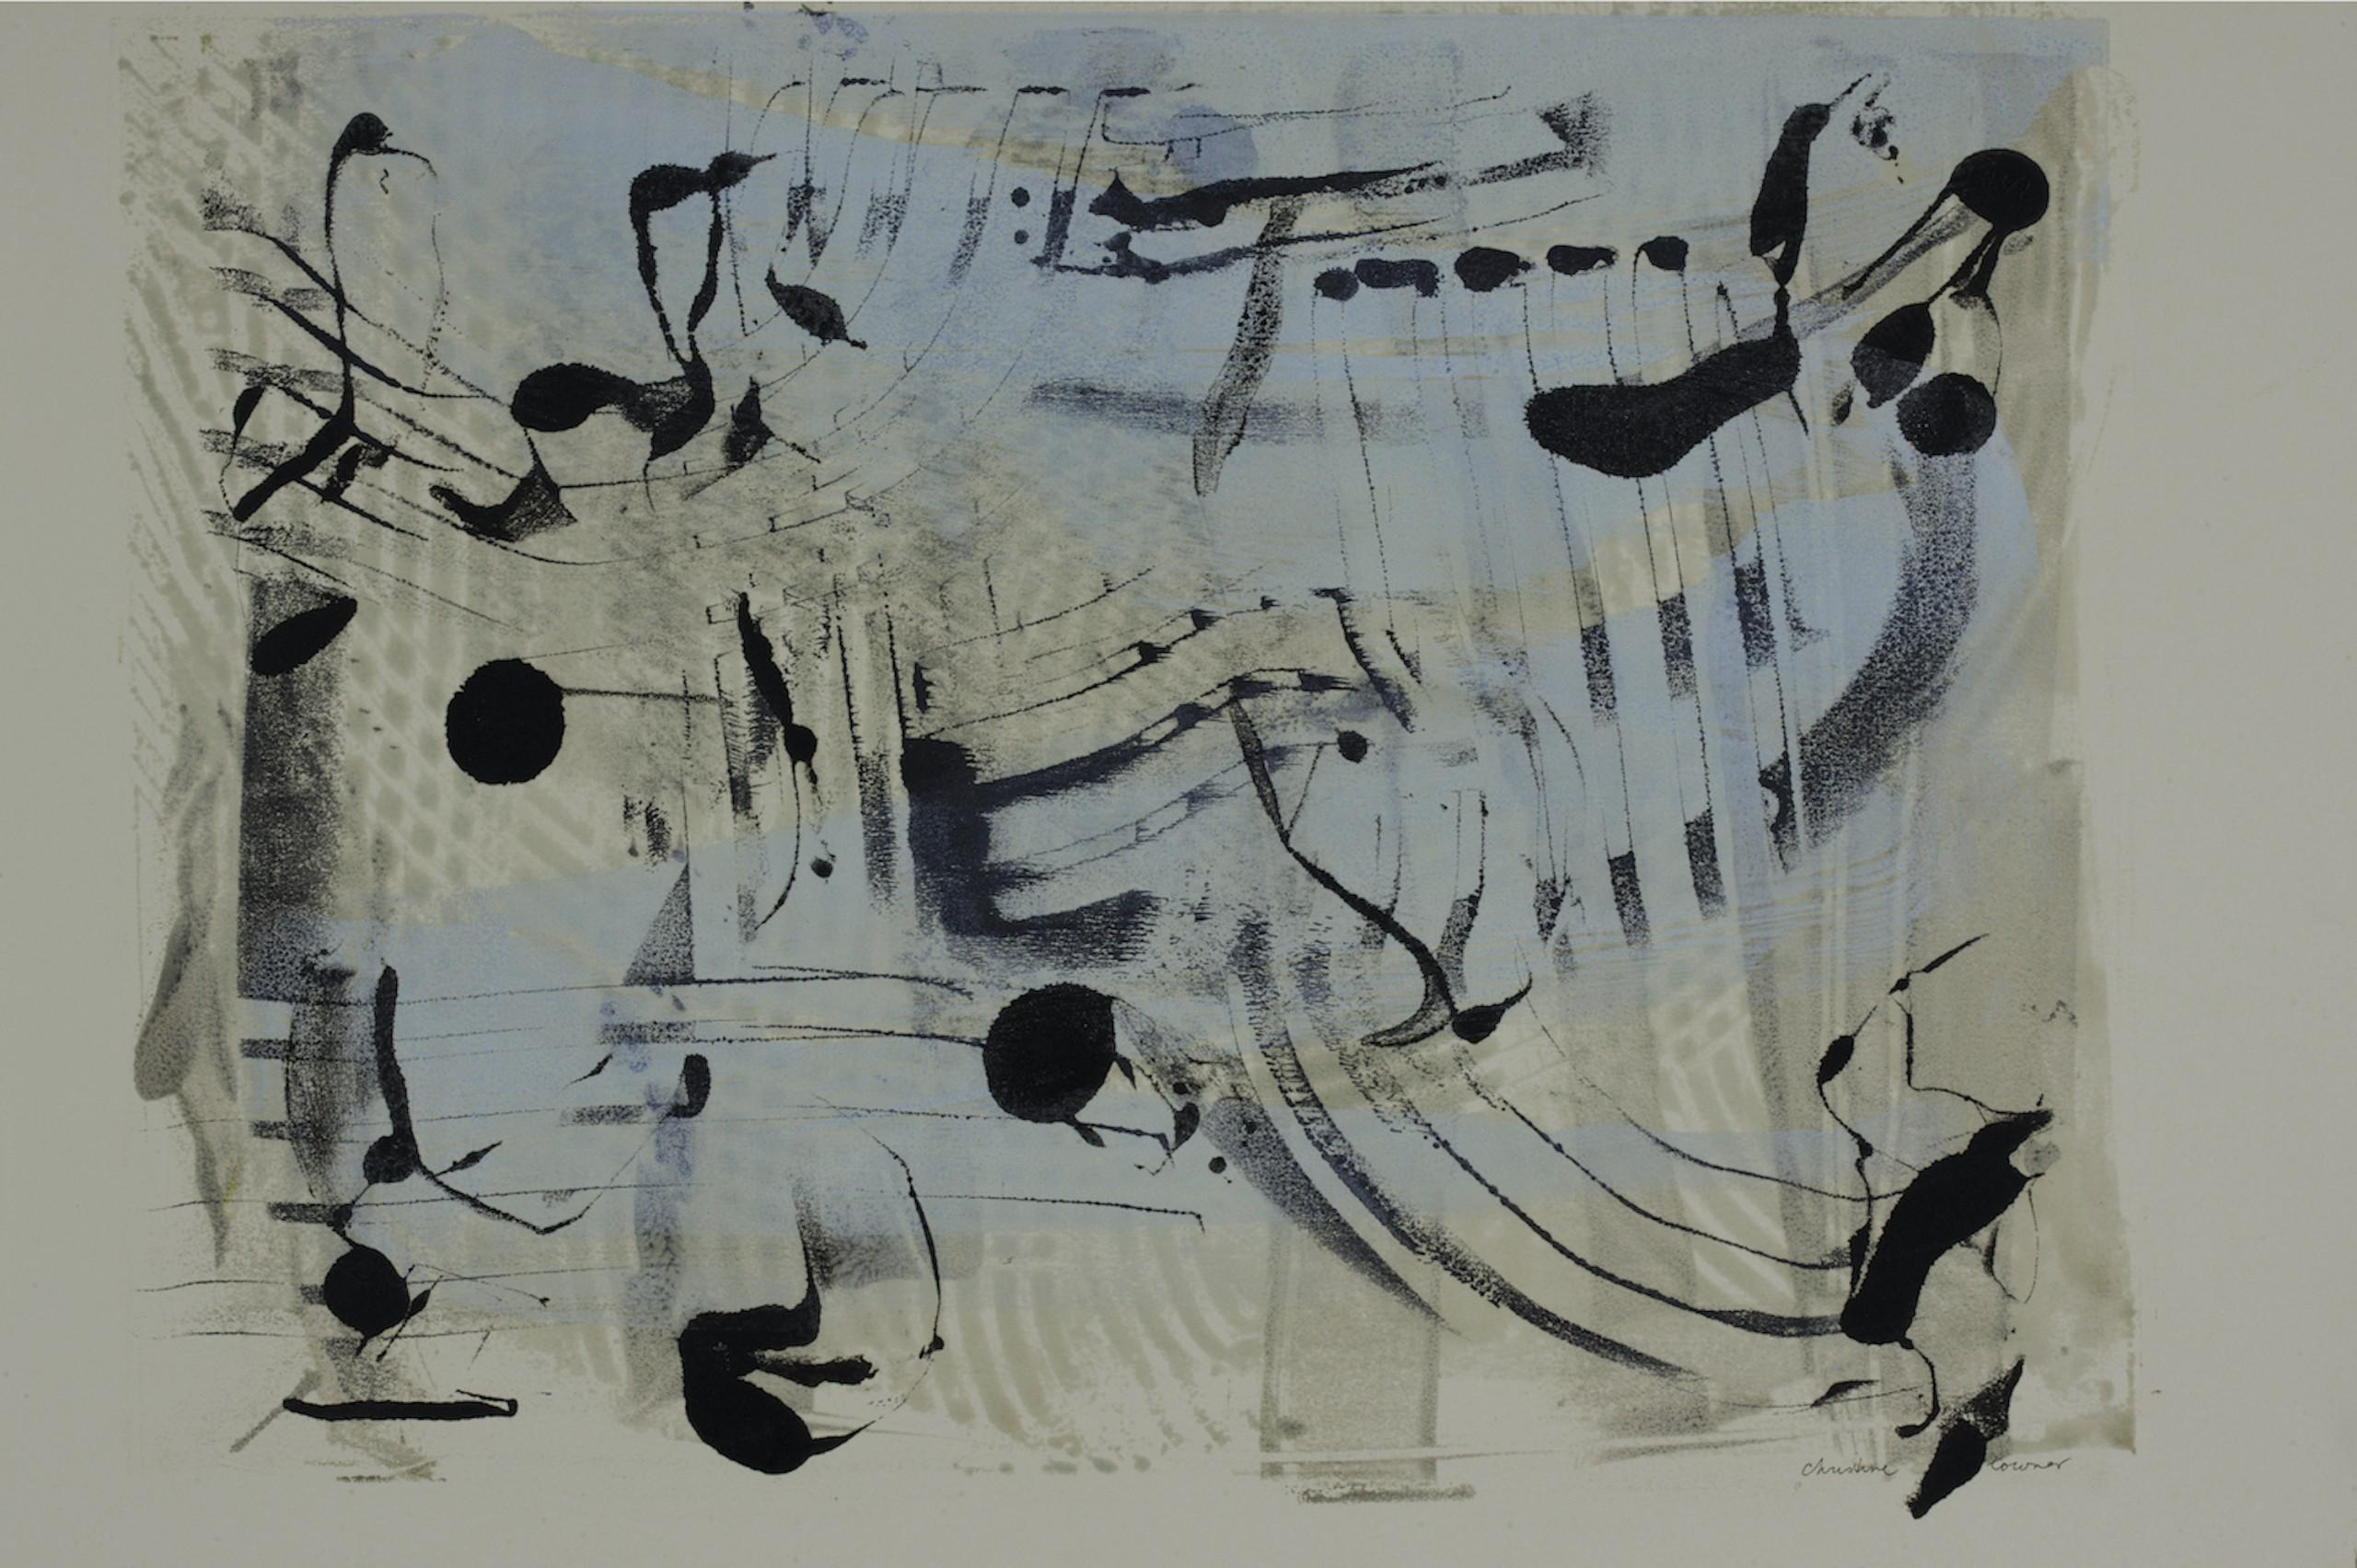 Bach, Encaustic on Rives Paper, 30.5